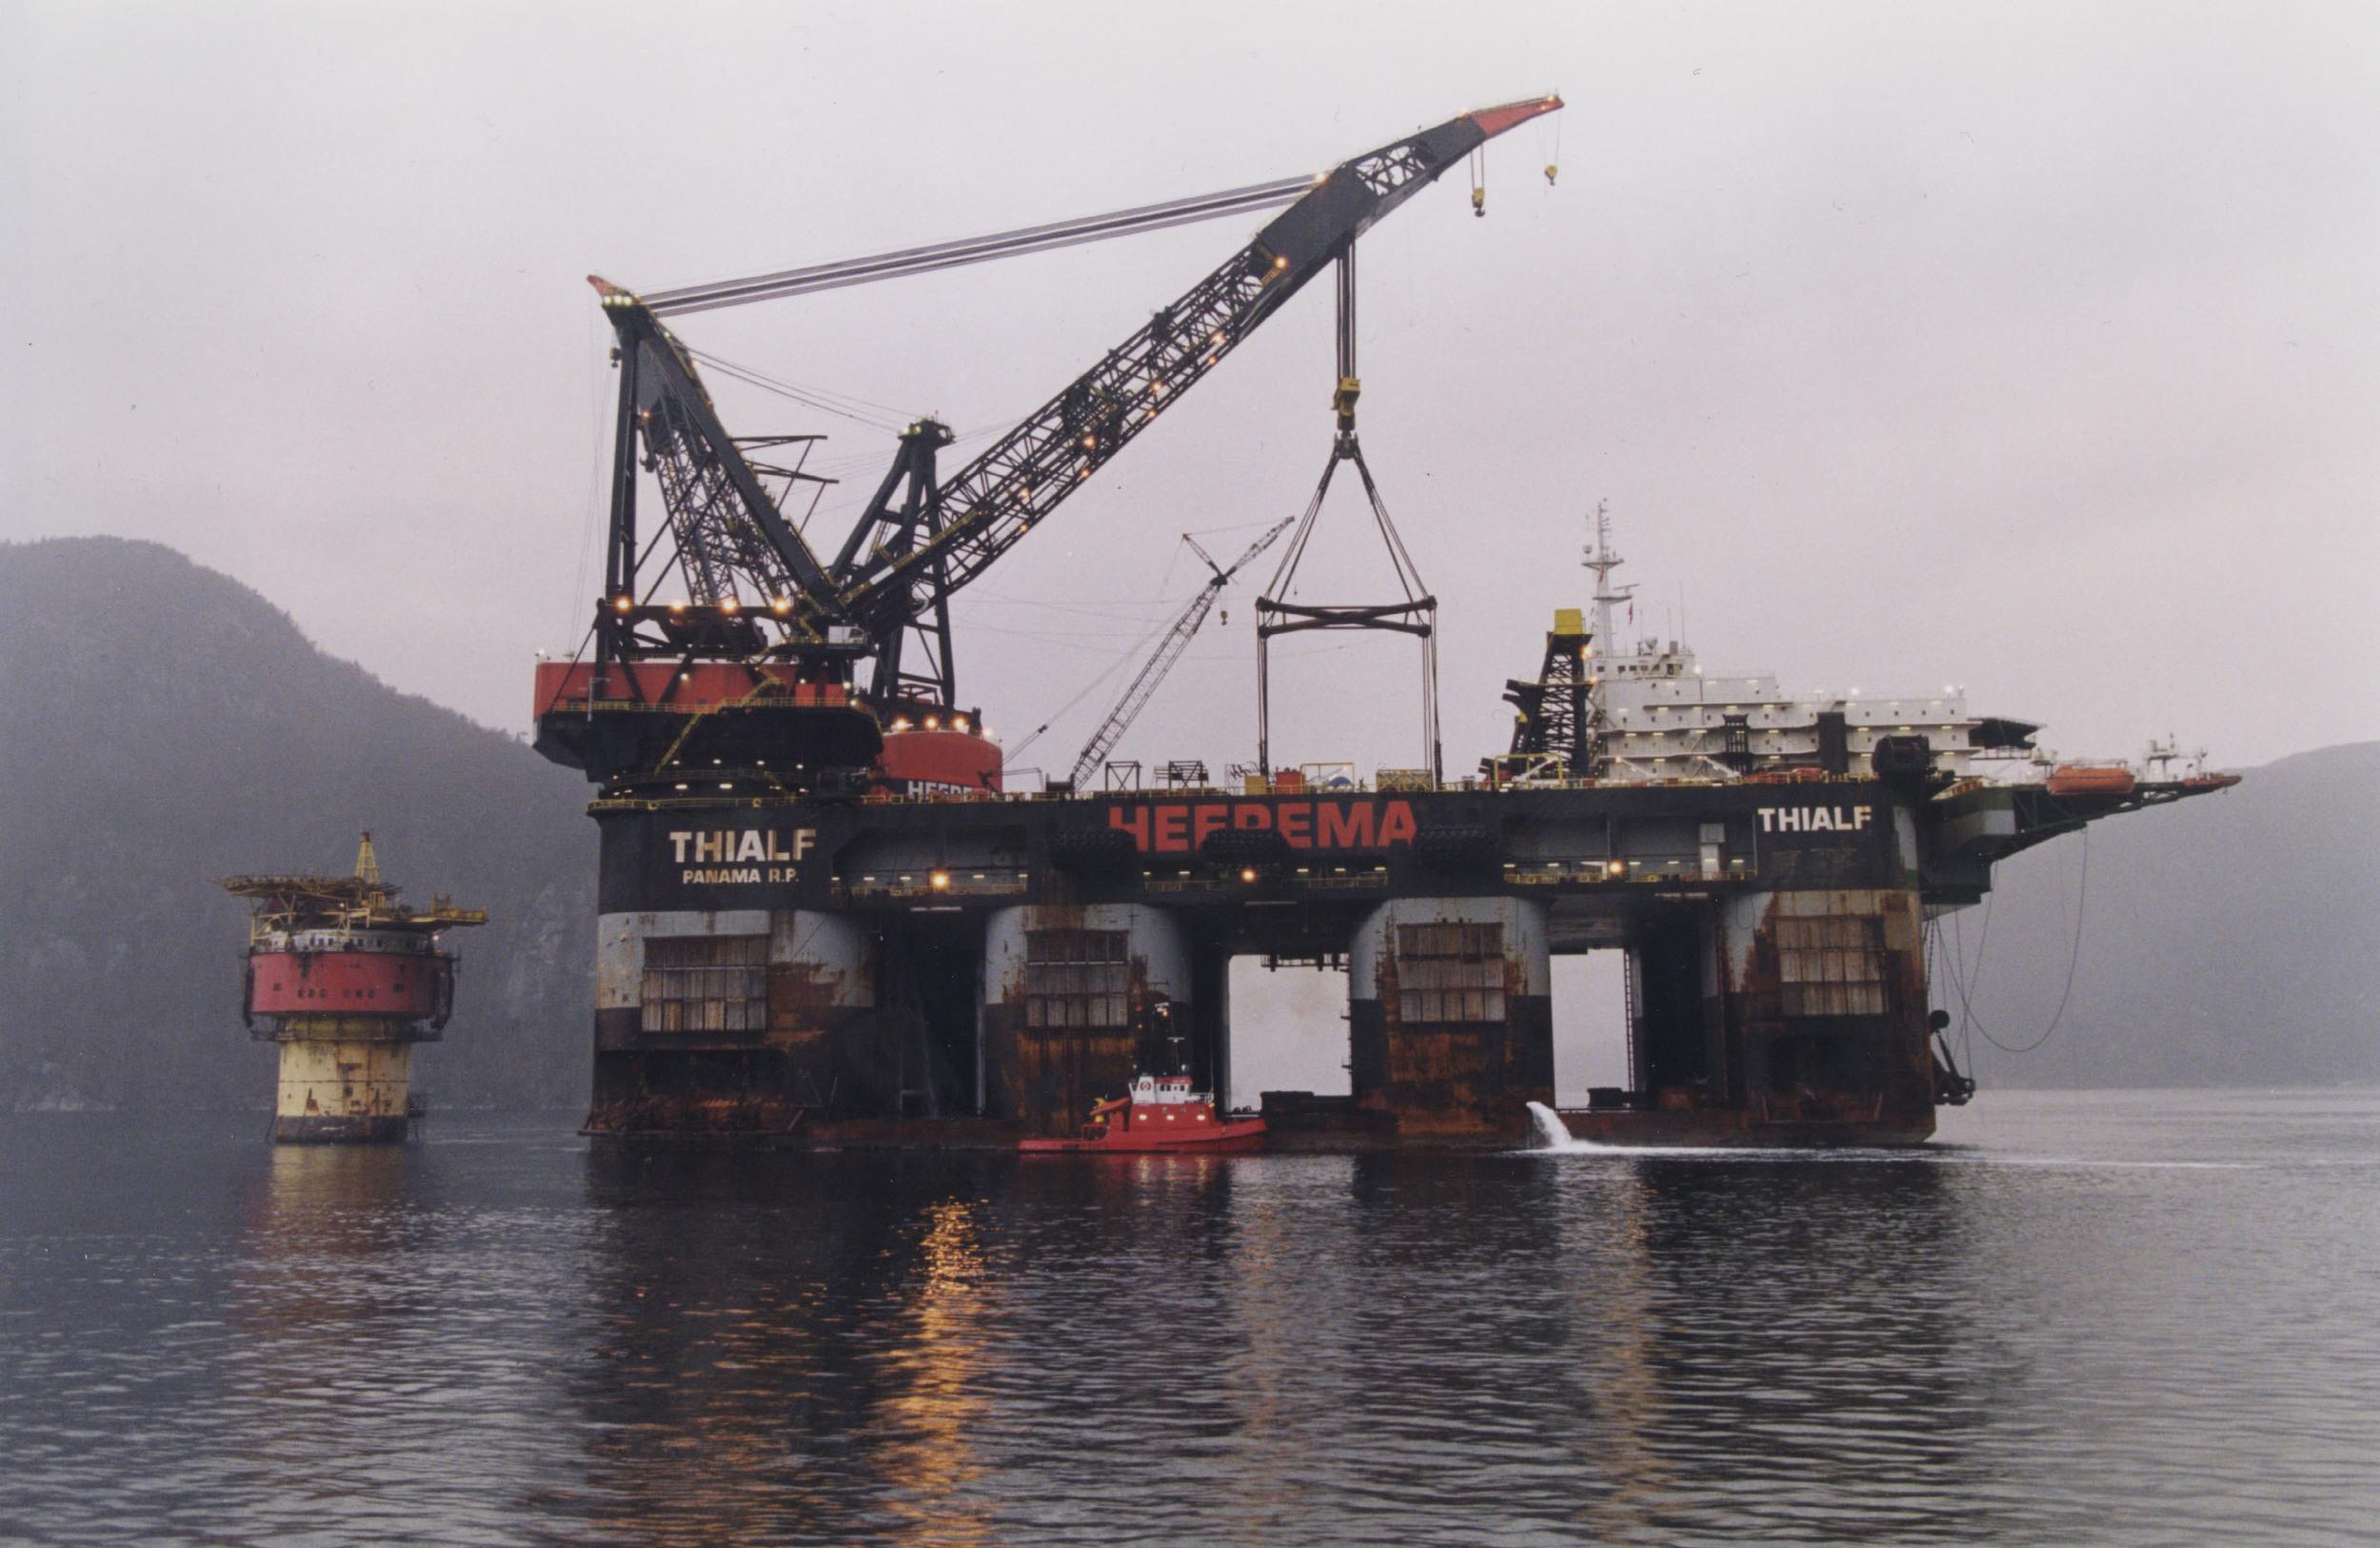 Greenpeace environmentalists remove gas from Gazprom's platform 24.08.2012 71